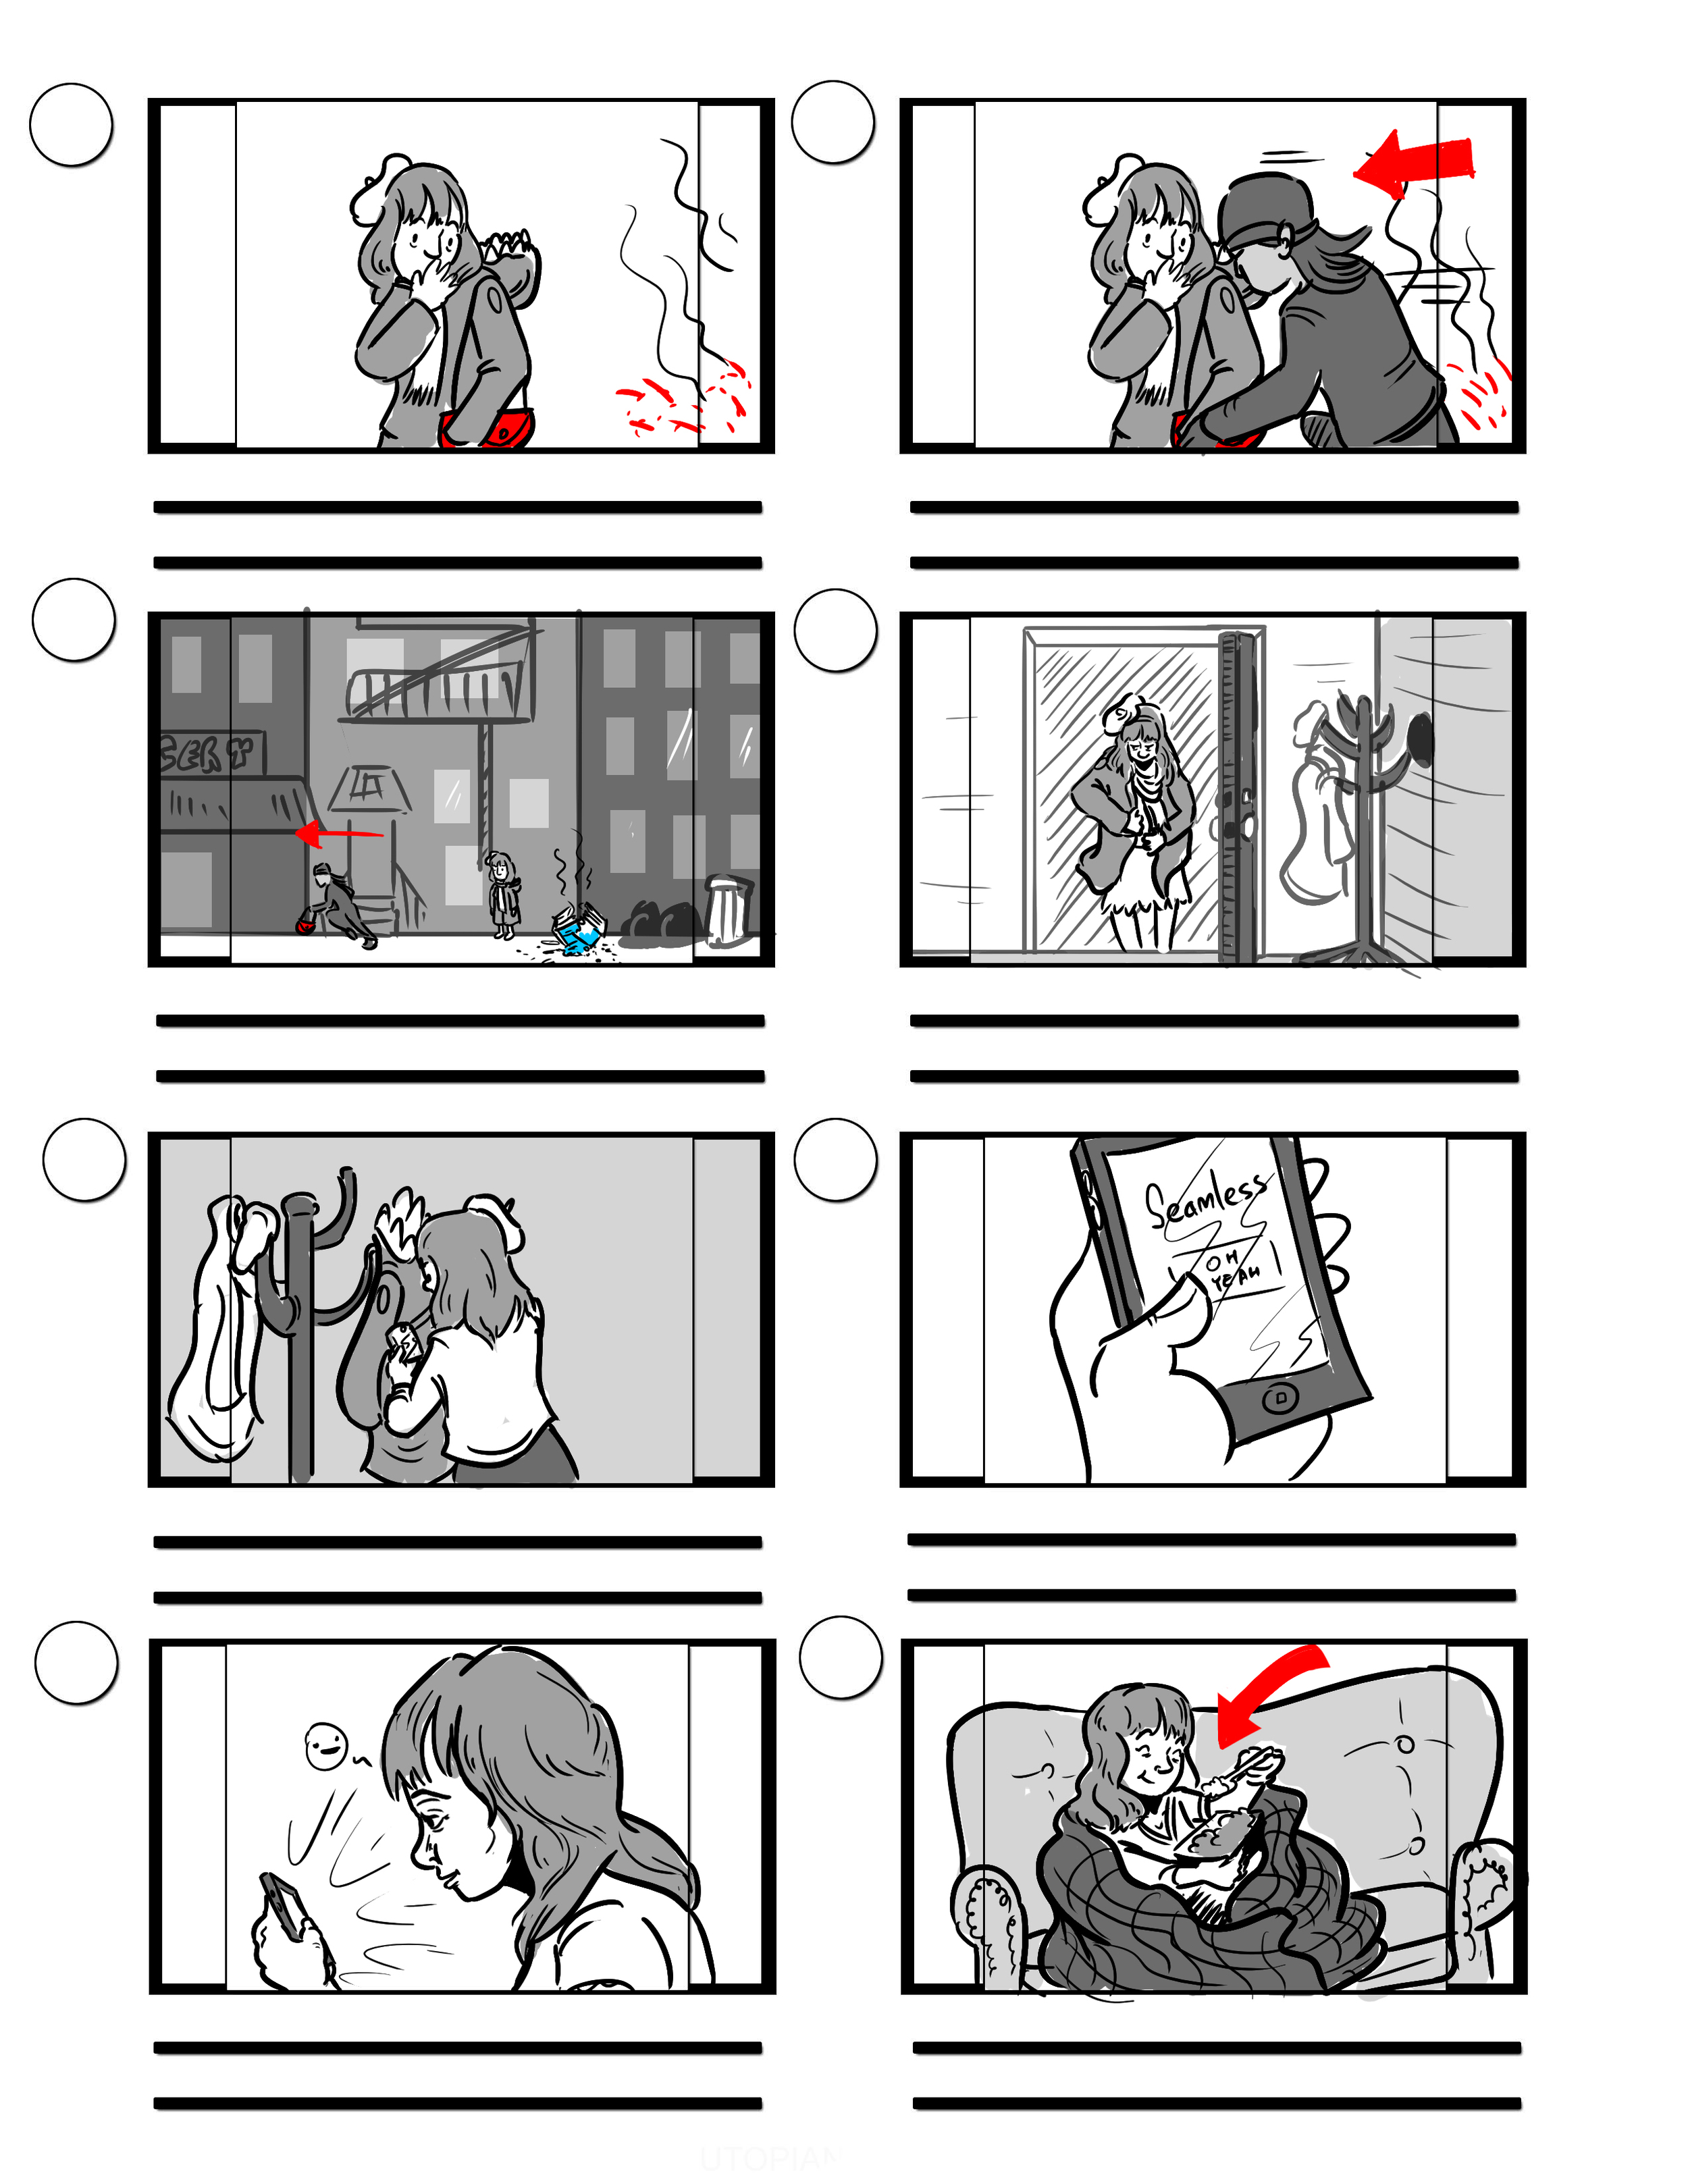 Seamless ThatGirl storyboard5.jpg